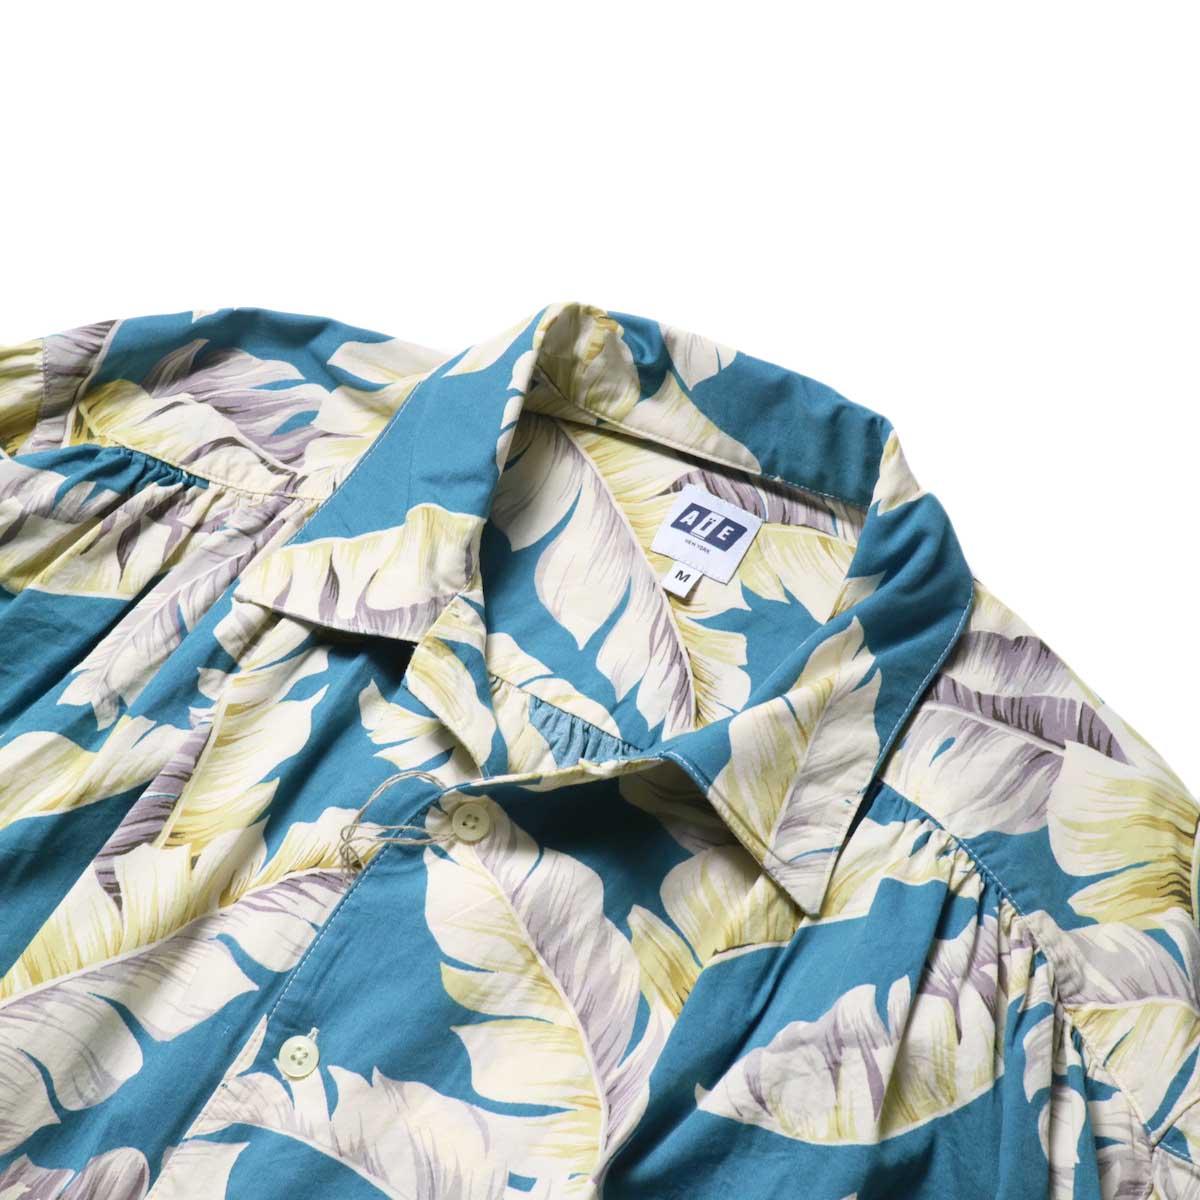 AiE / Painter Shirt - Hawaiian Print (Turquoise)襟、ギャザー